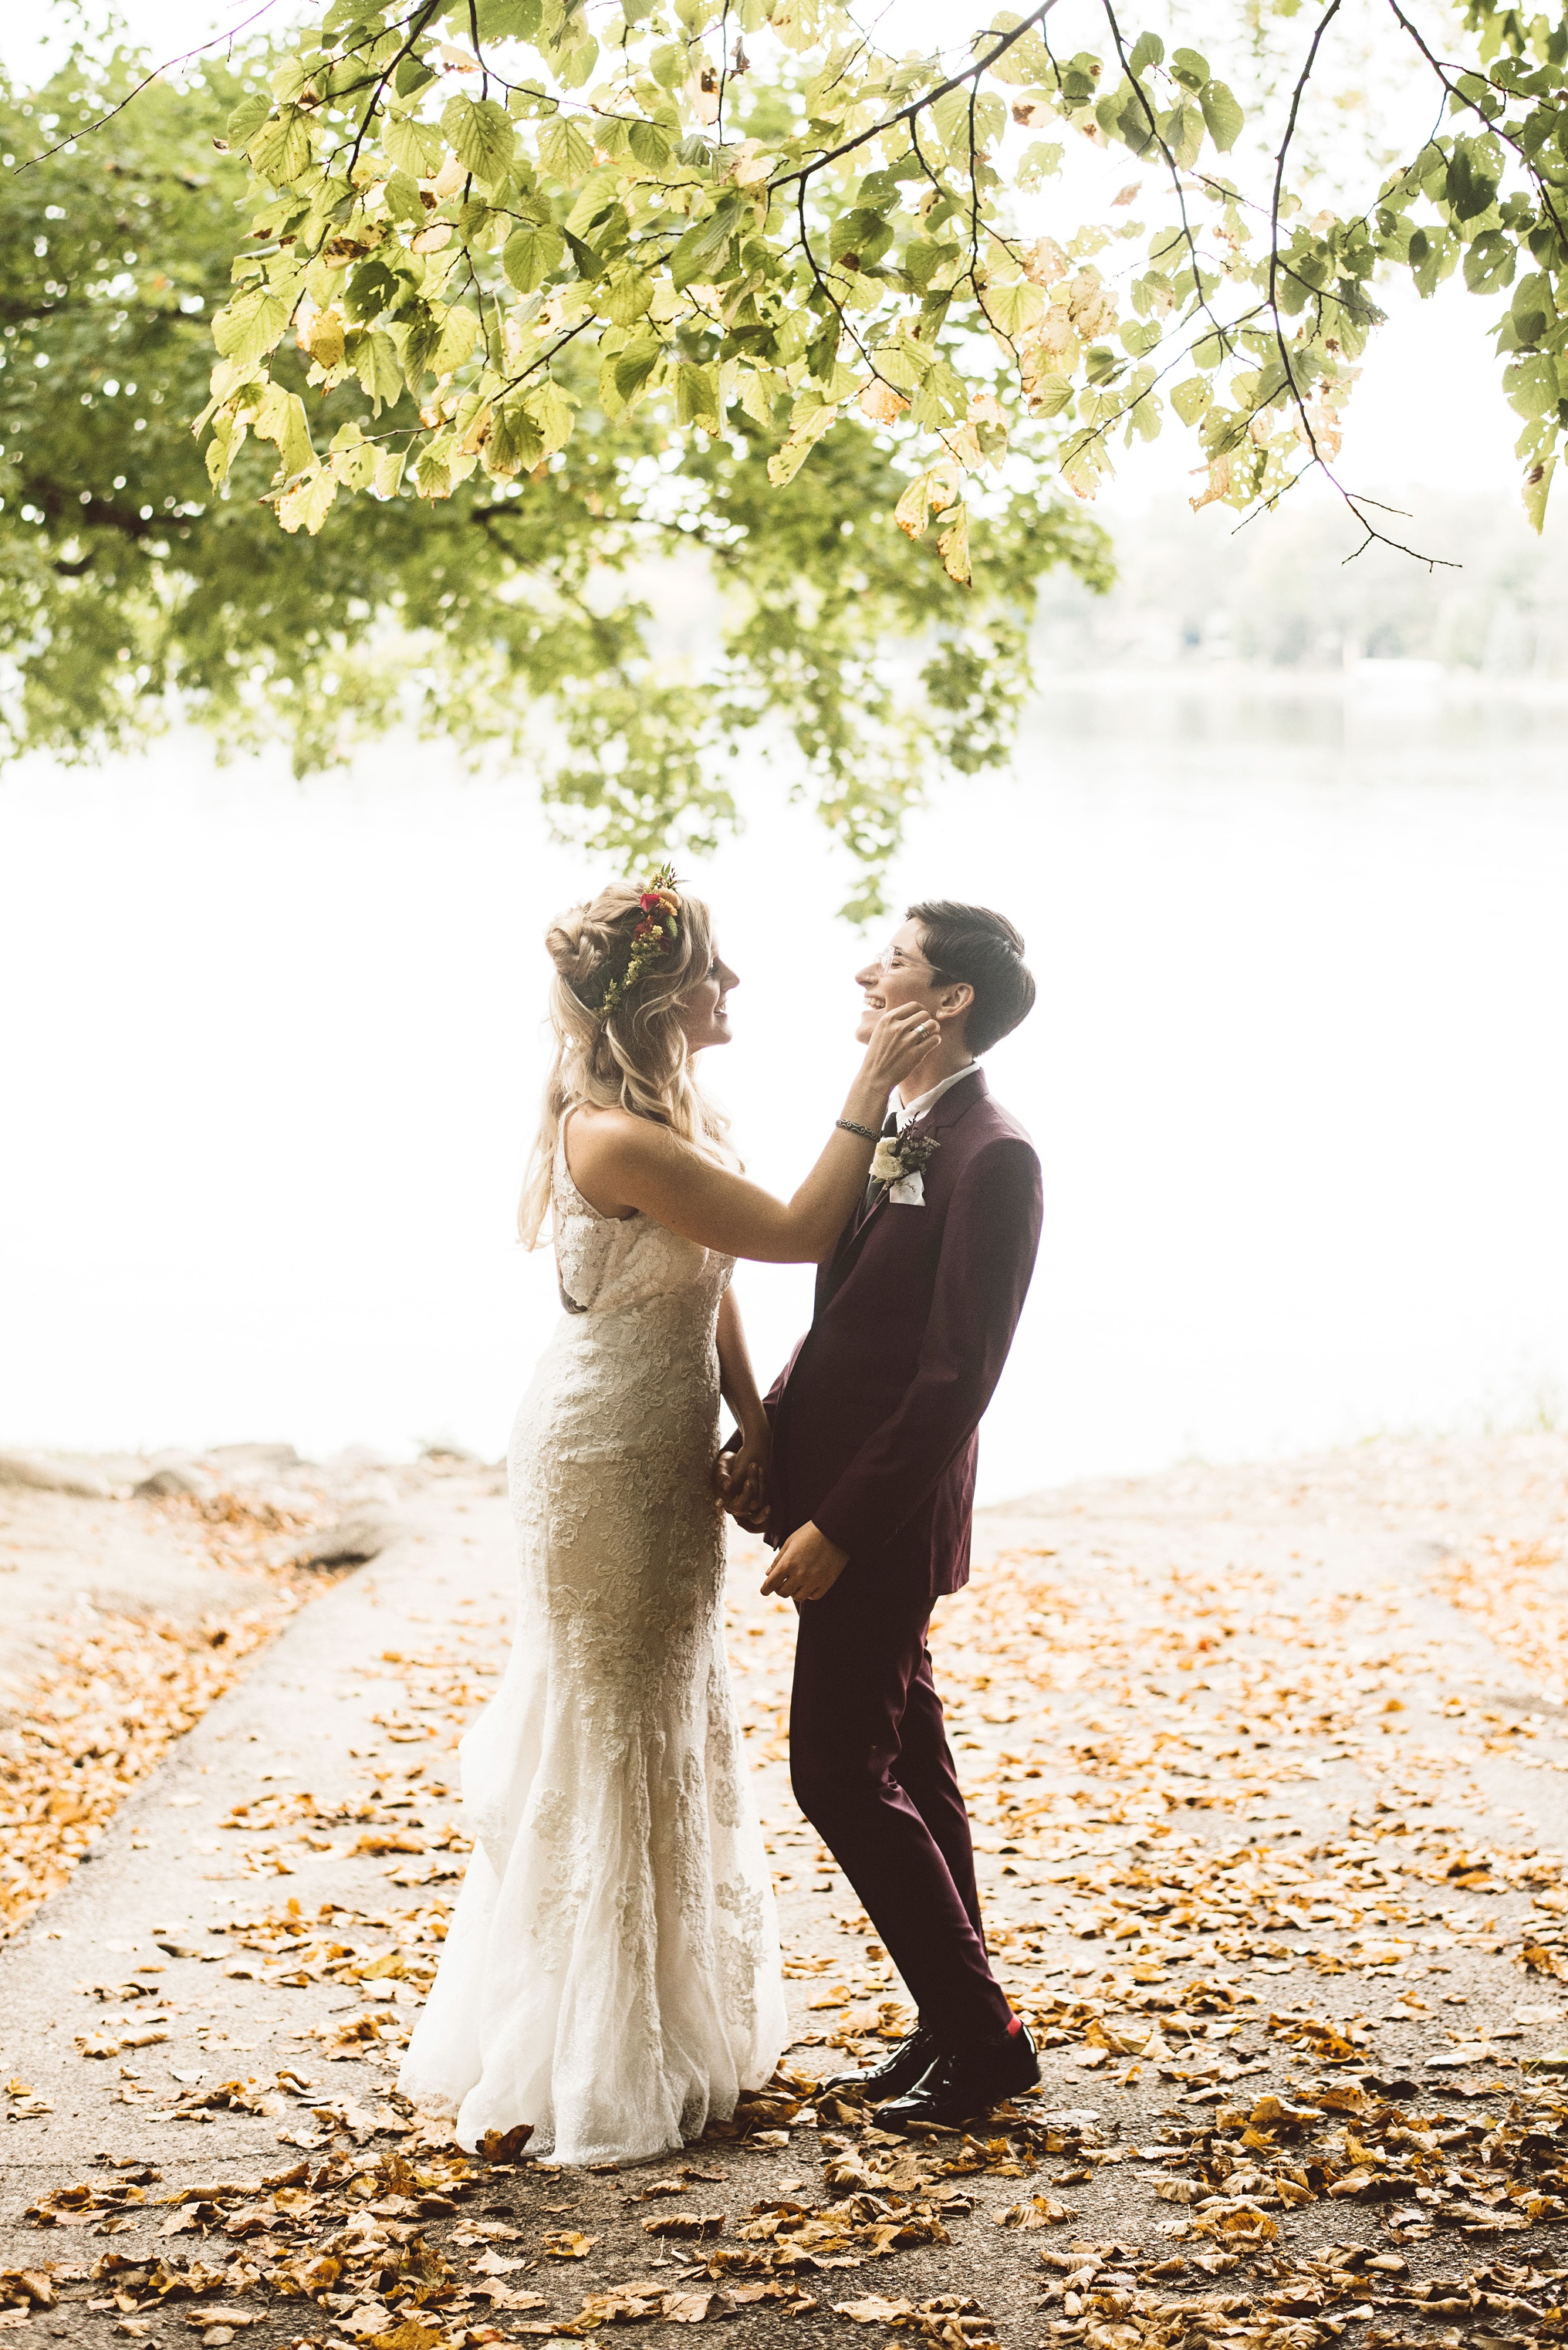 best_wedding_photography_2017_by_lucas_botz_photography_209.jpg